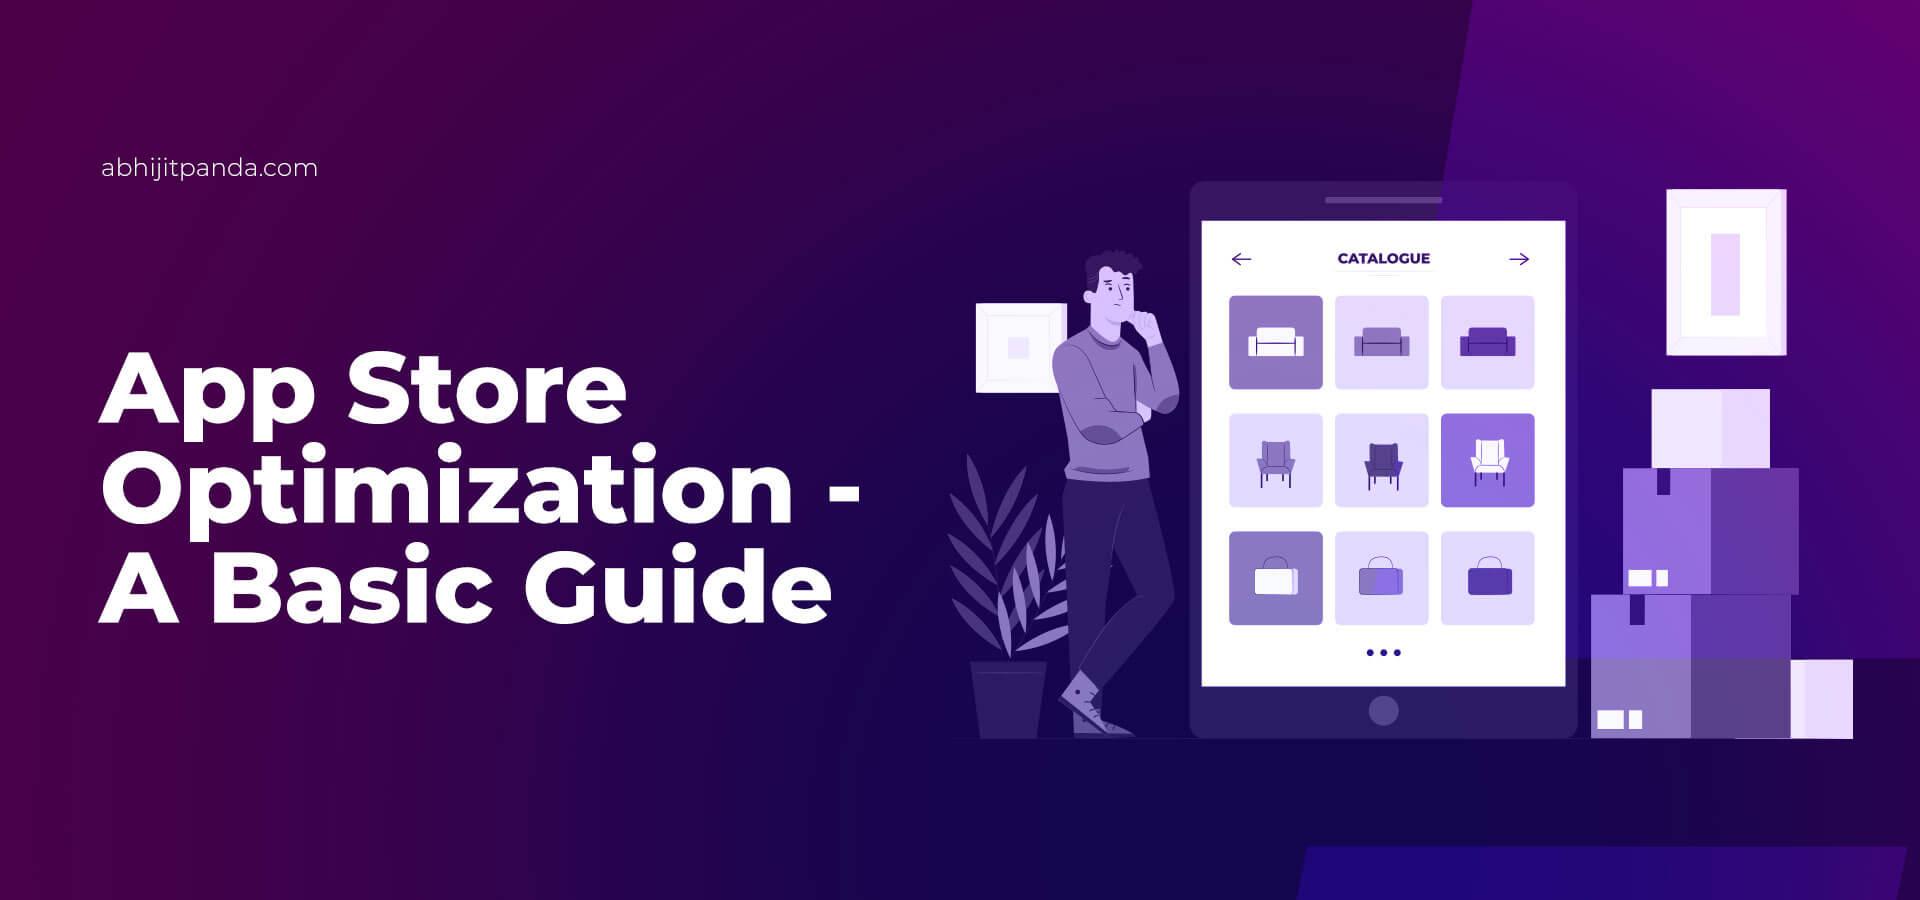 App Store Optimization- A Basic Guide